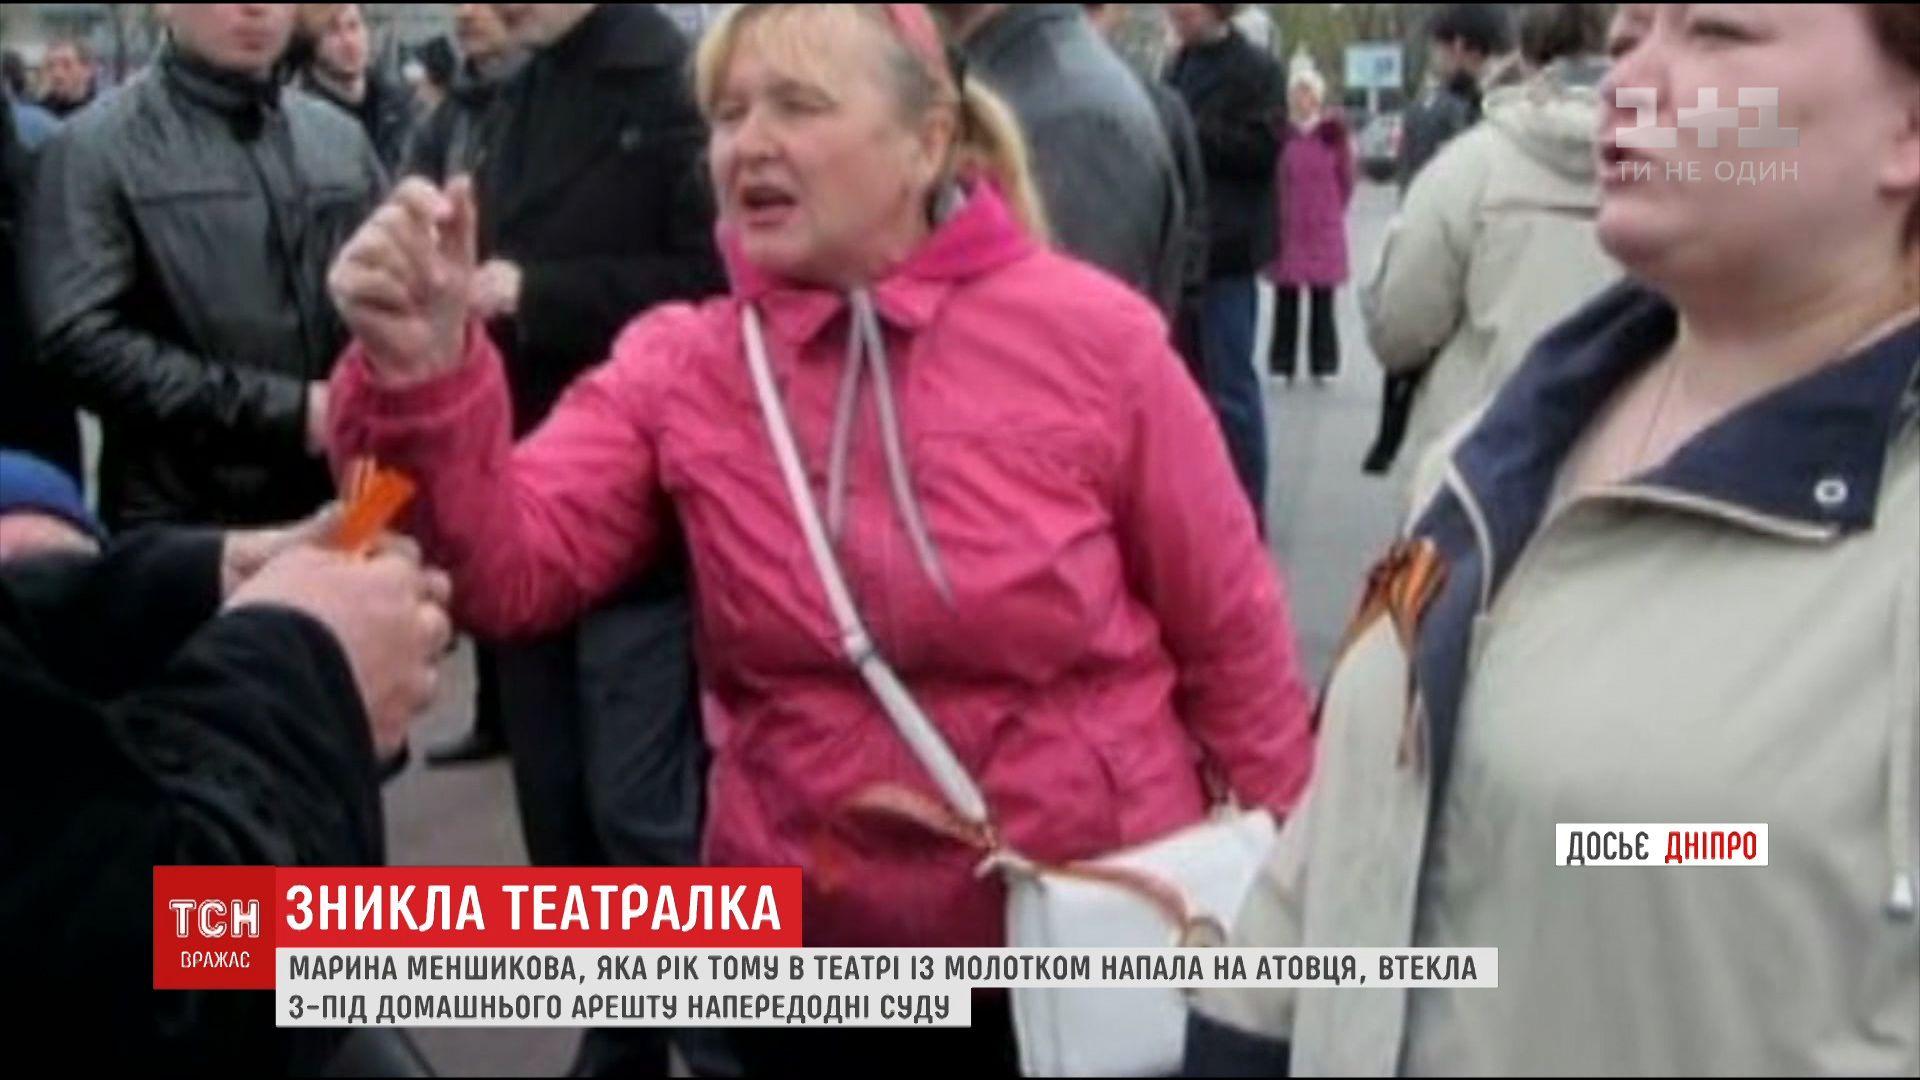 Сепаратистка, которая разбила втеатре голову бойцу АТО, снова убежала